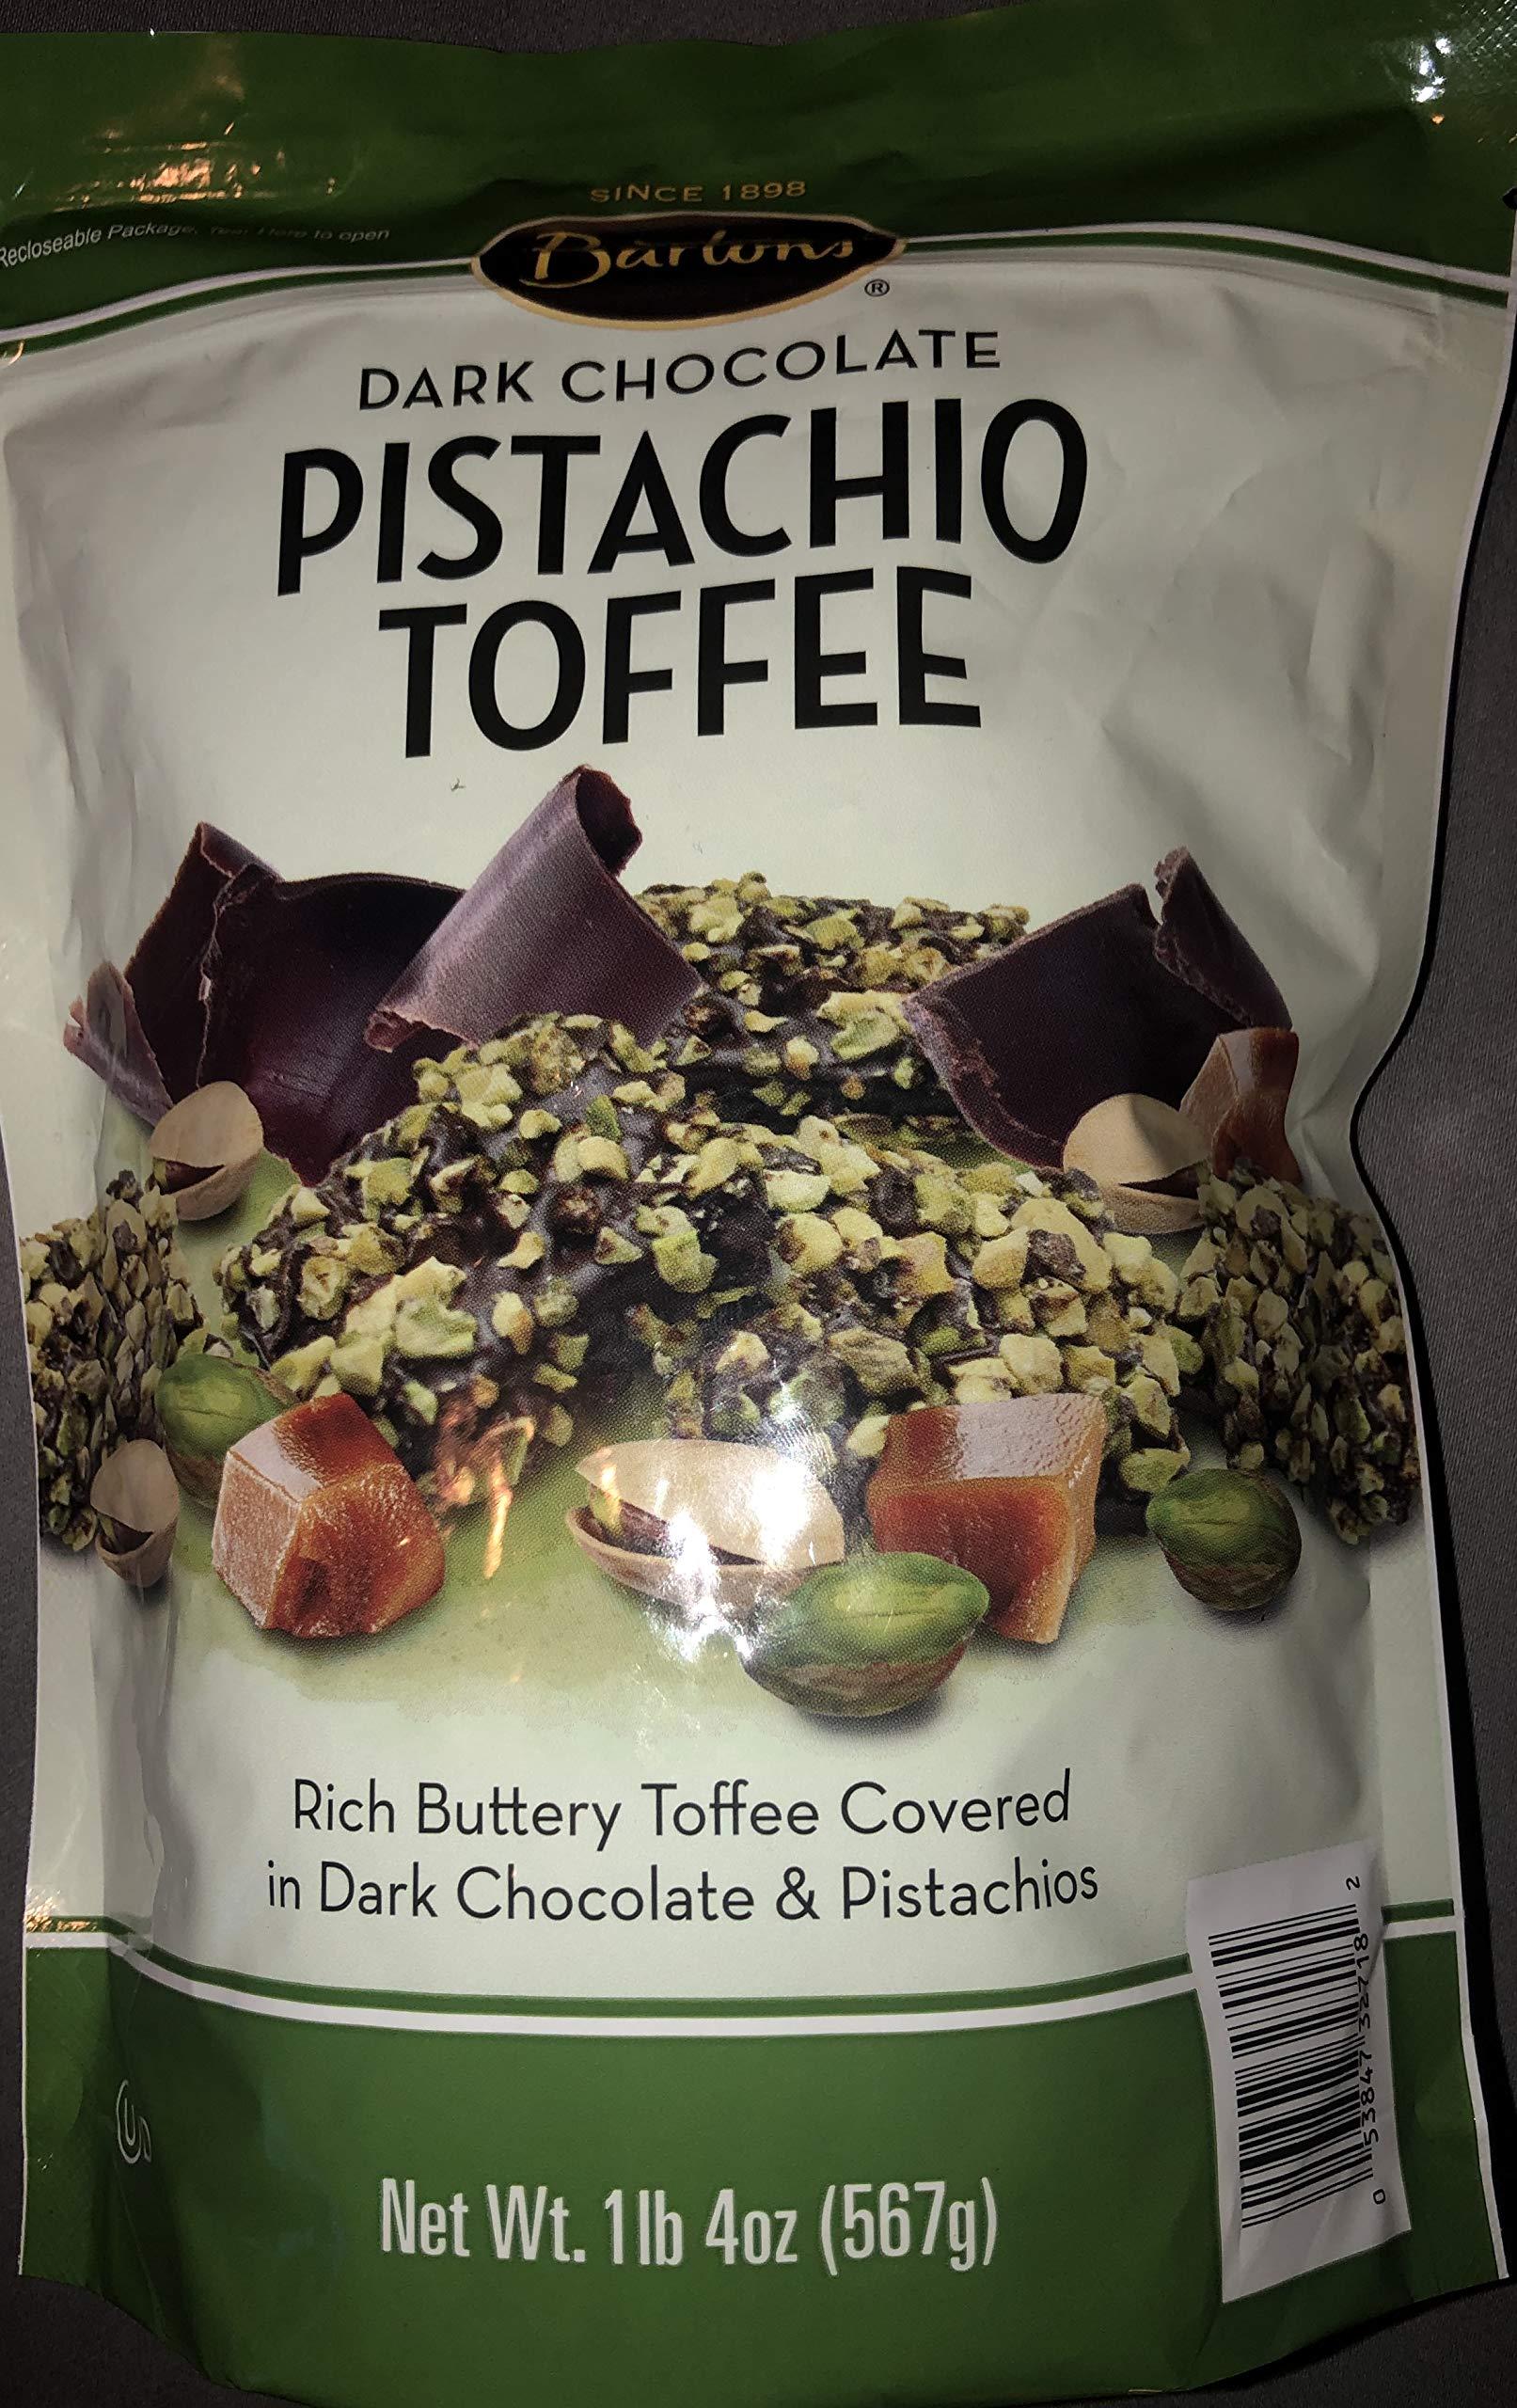 Bartons Dark Chocolate Pistachio Toffee Bites (1 Bag (1 lb 4 Oz))